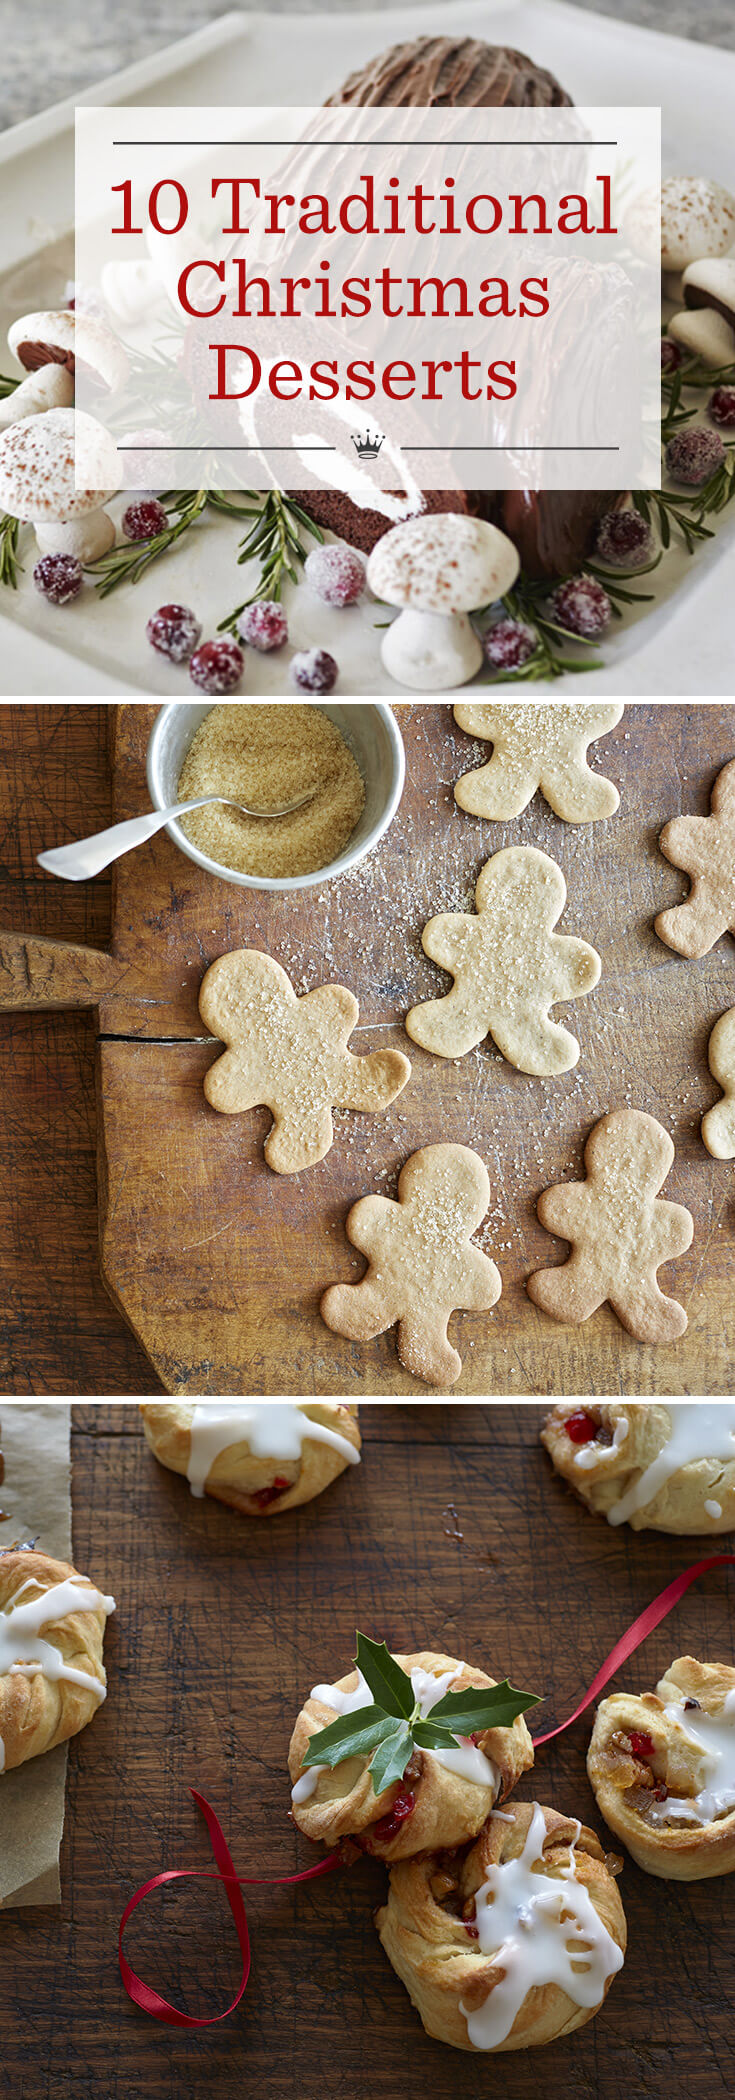 Traditional Christmas Desserts.10 Traditional Christmas Desserts Hallmark Ideas Inspiration